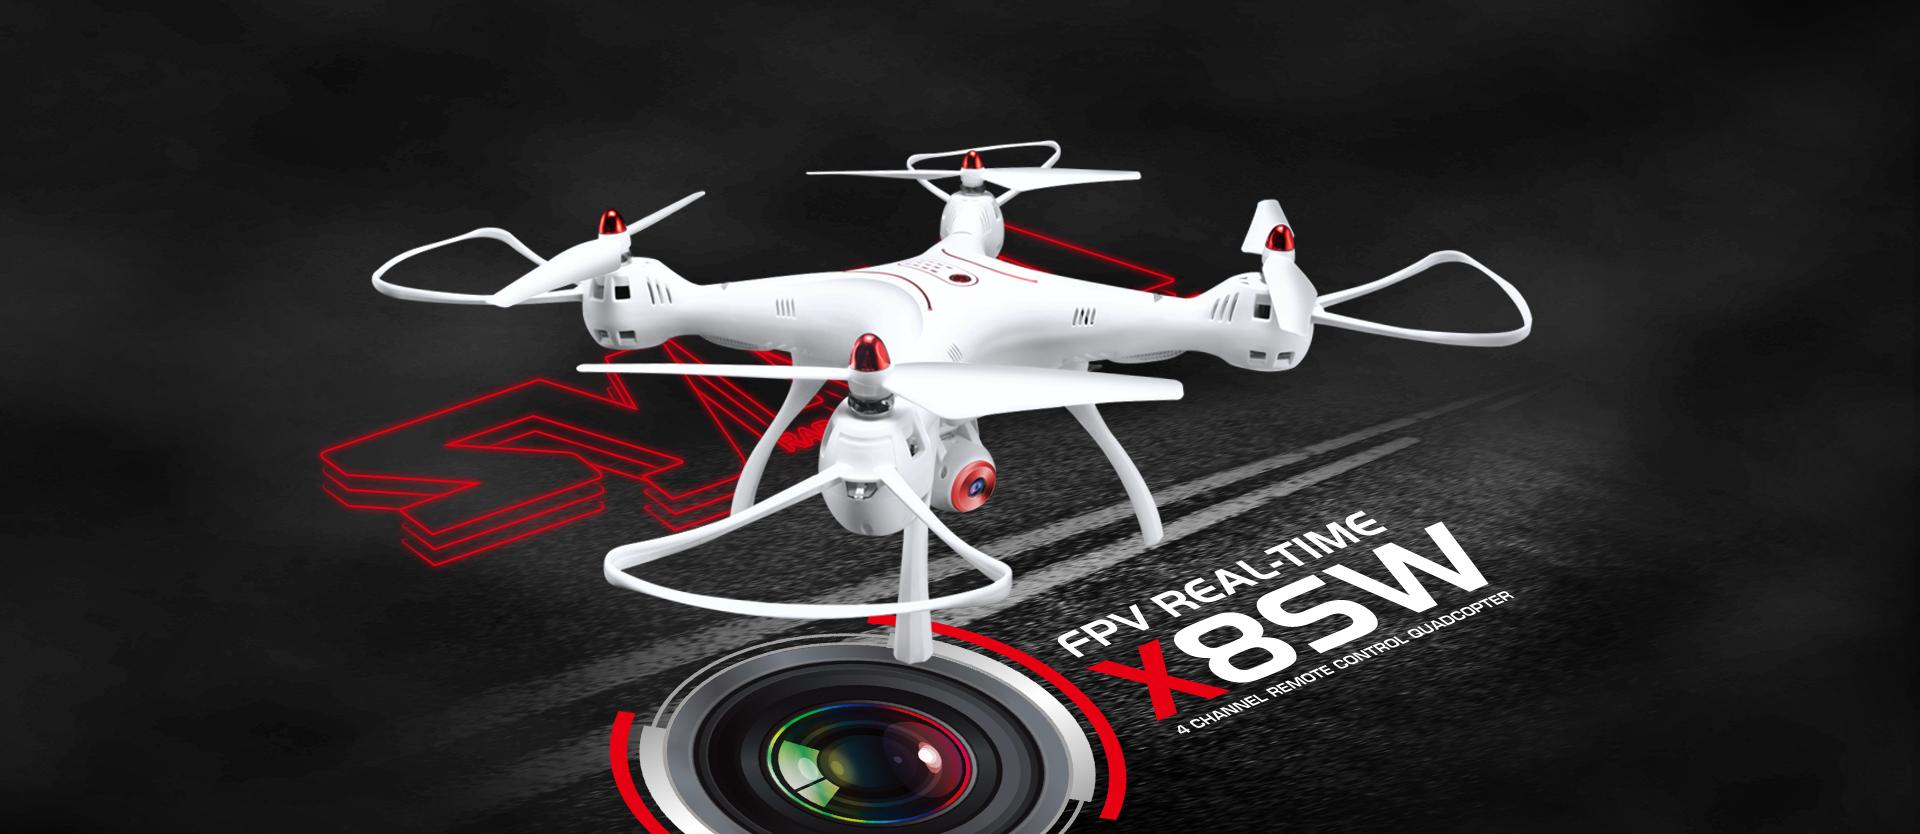 Syma X8SW: Neuer Quadrocopter mit FPV-Übertragung